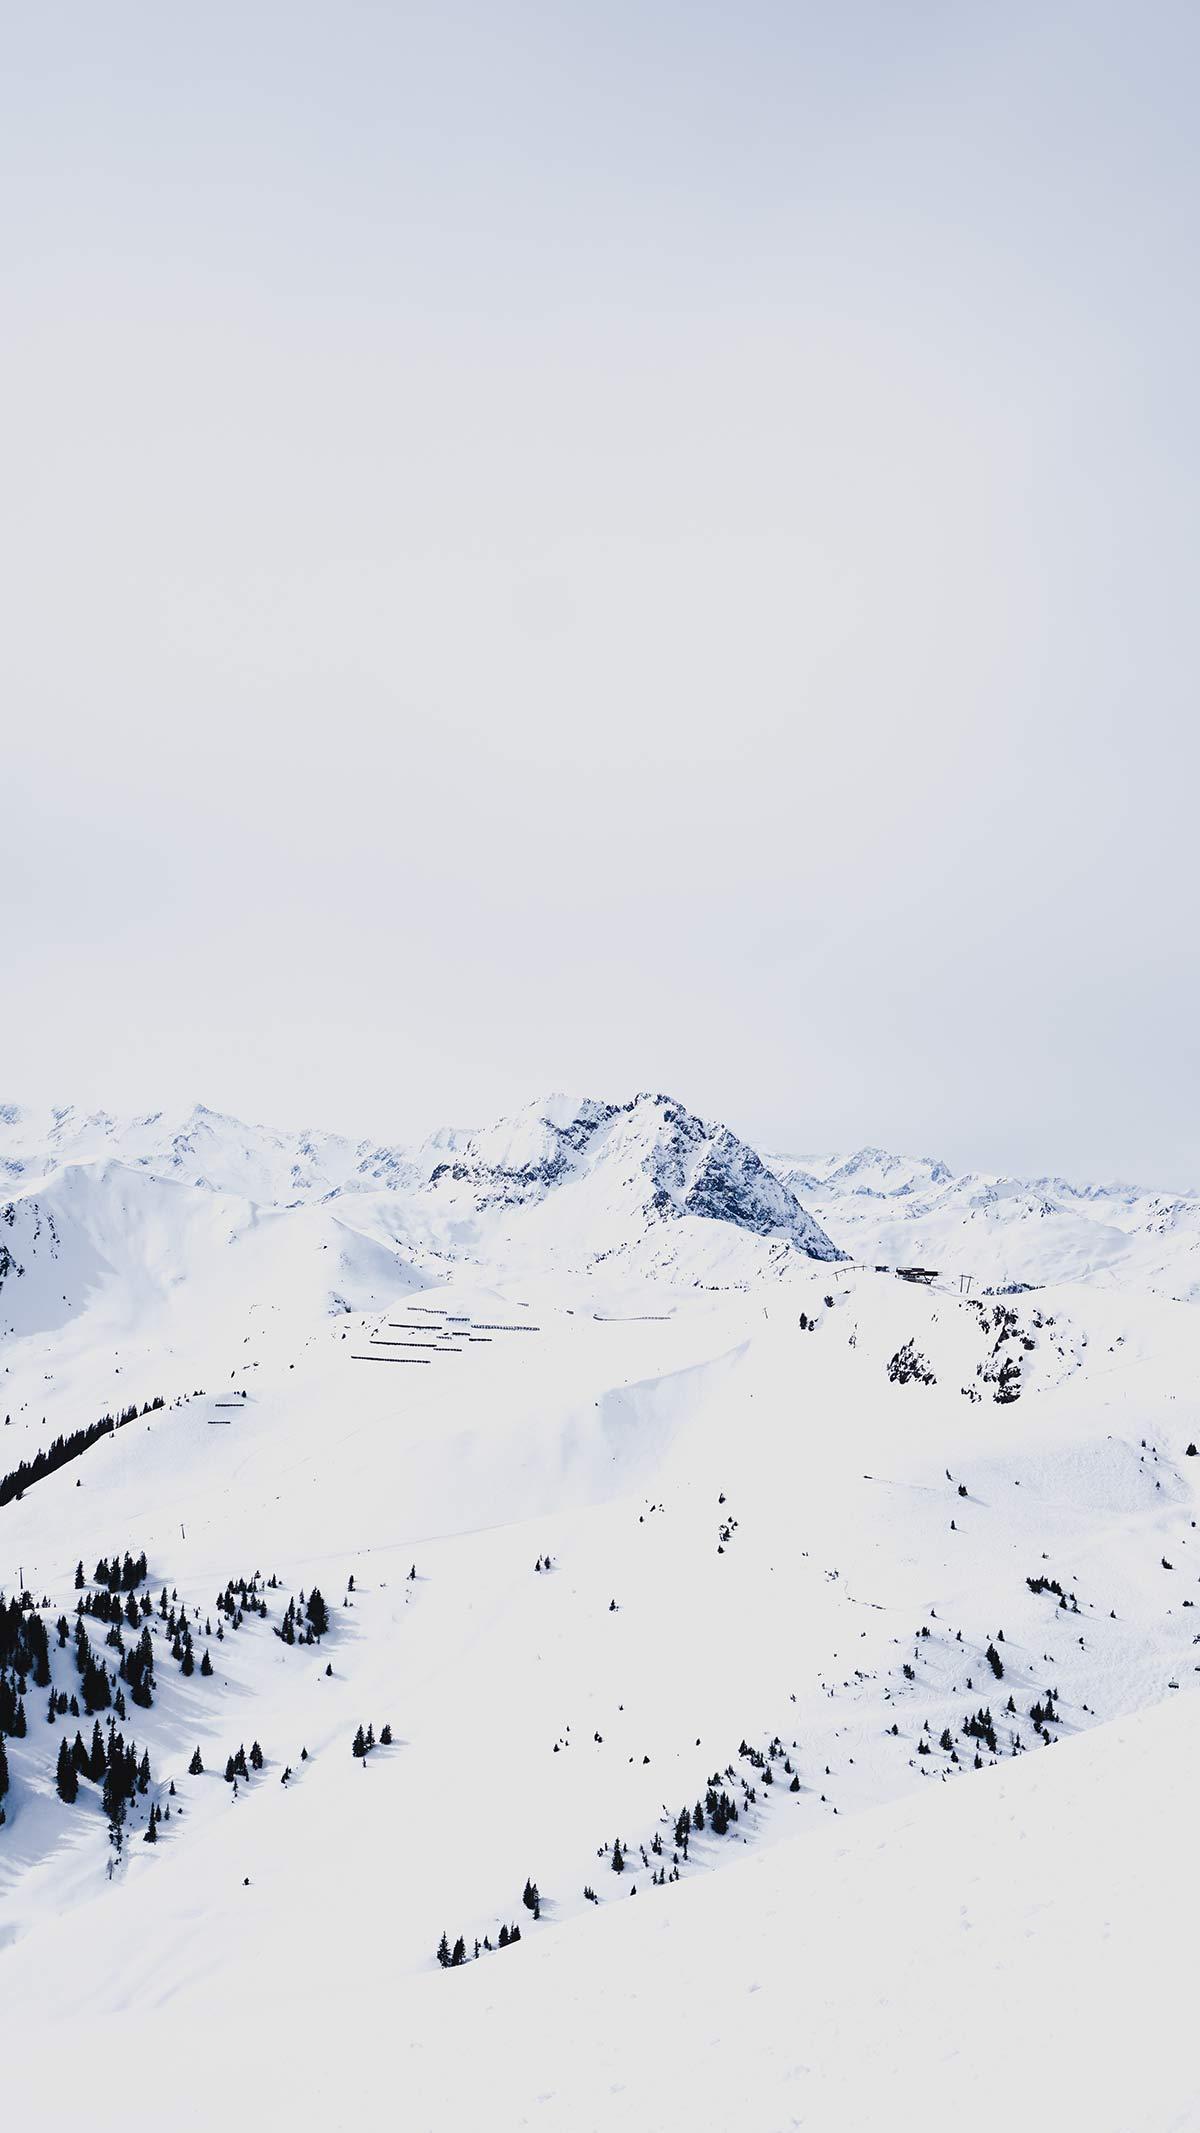 KitzSki Gebiet Ausblick Piste